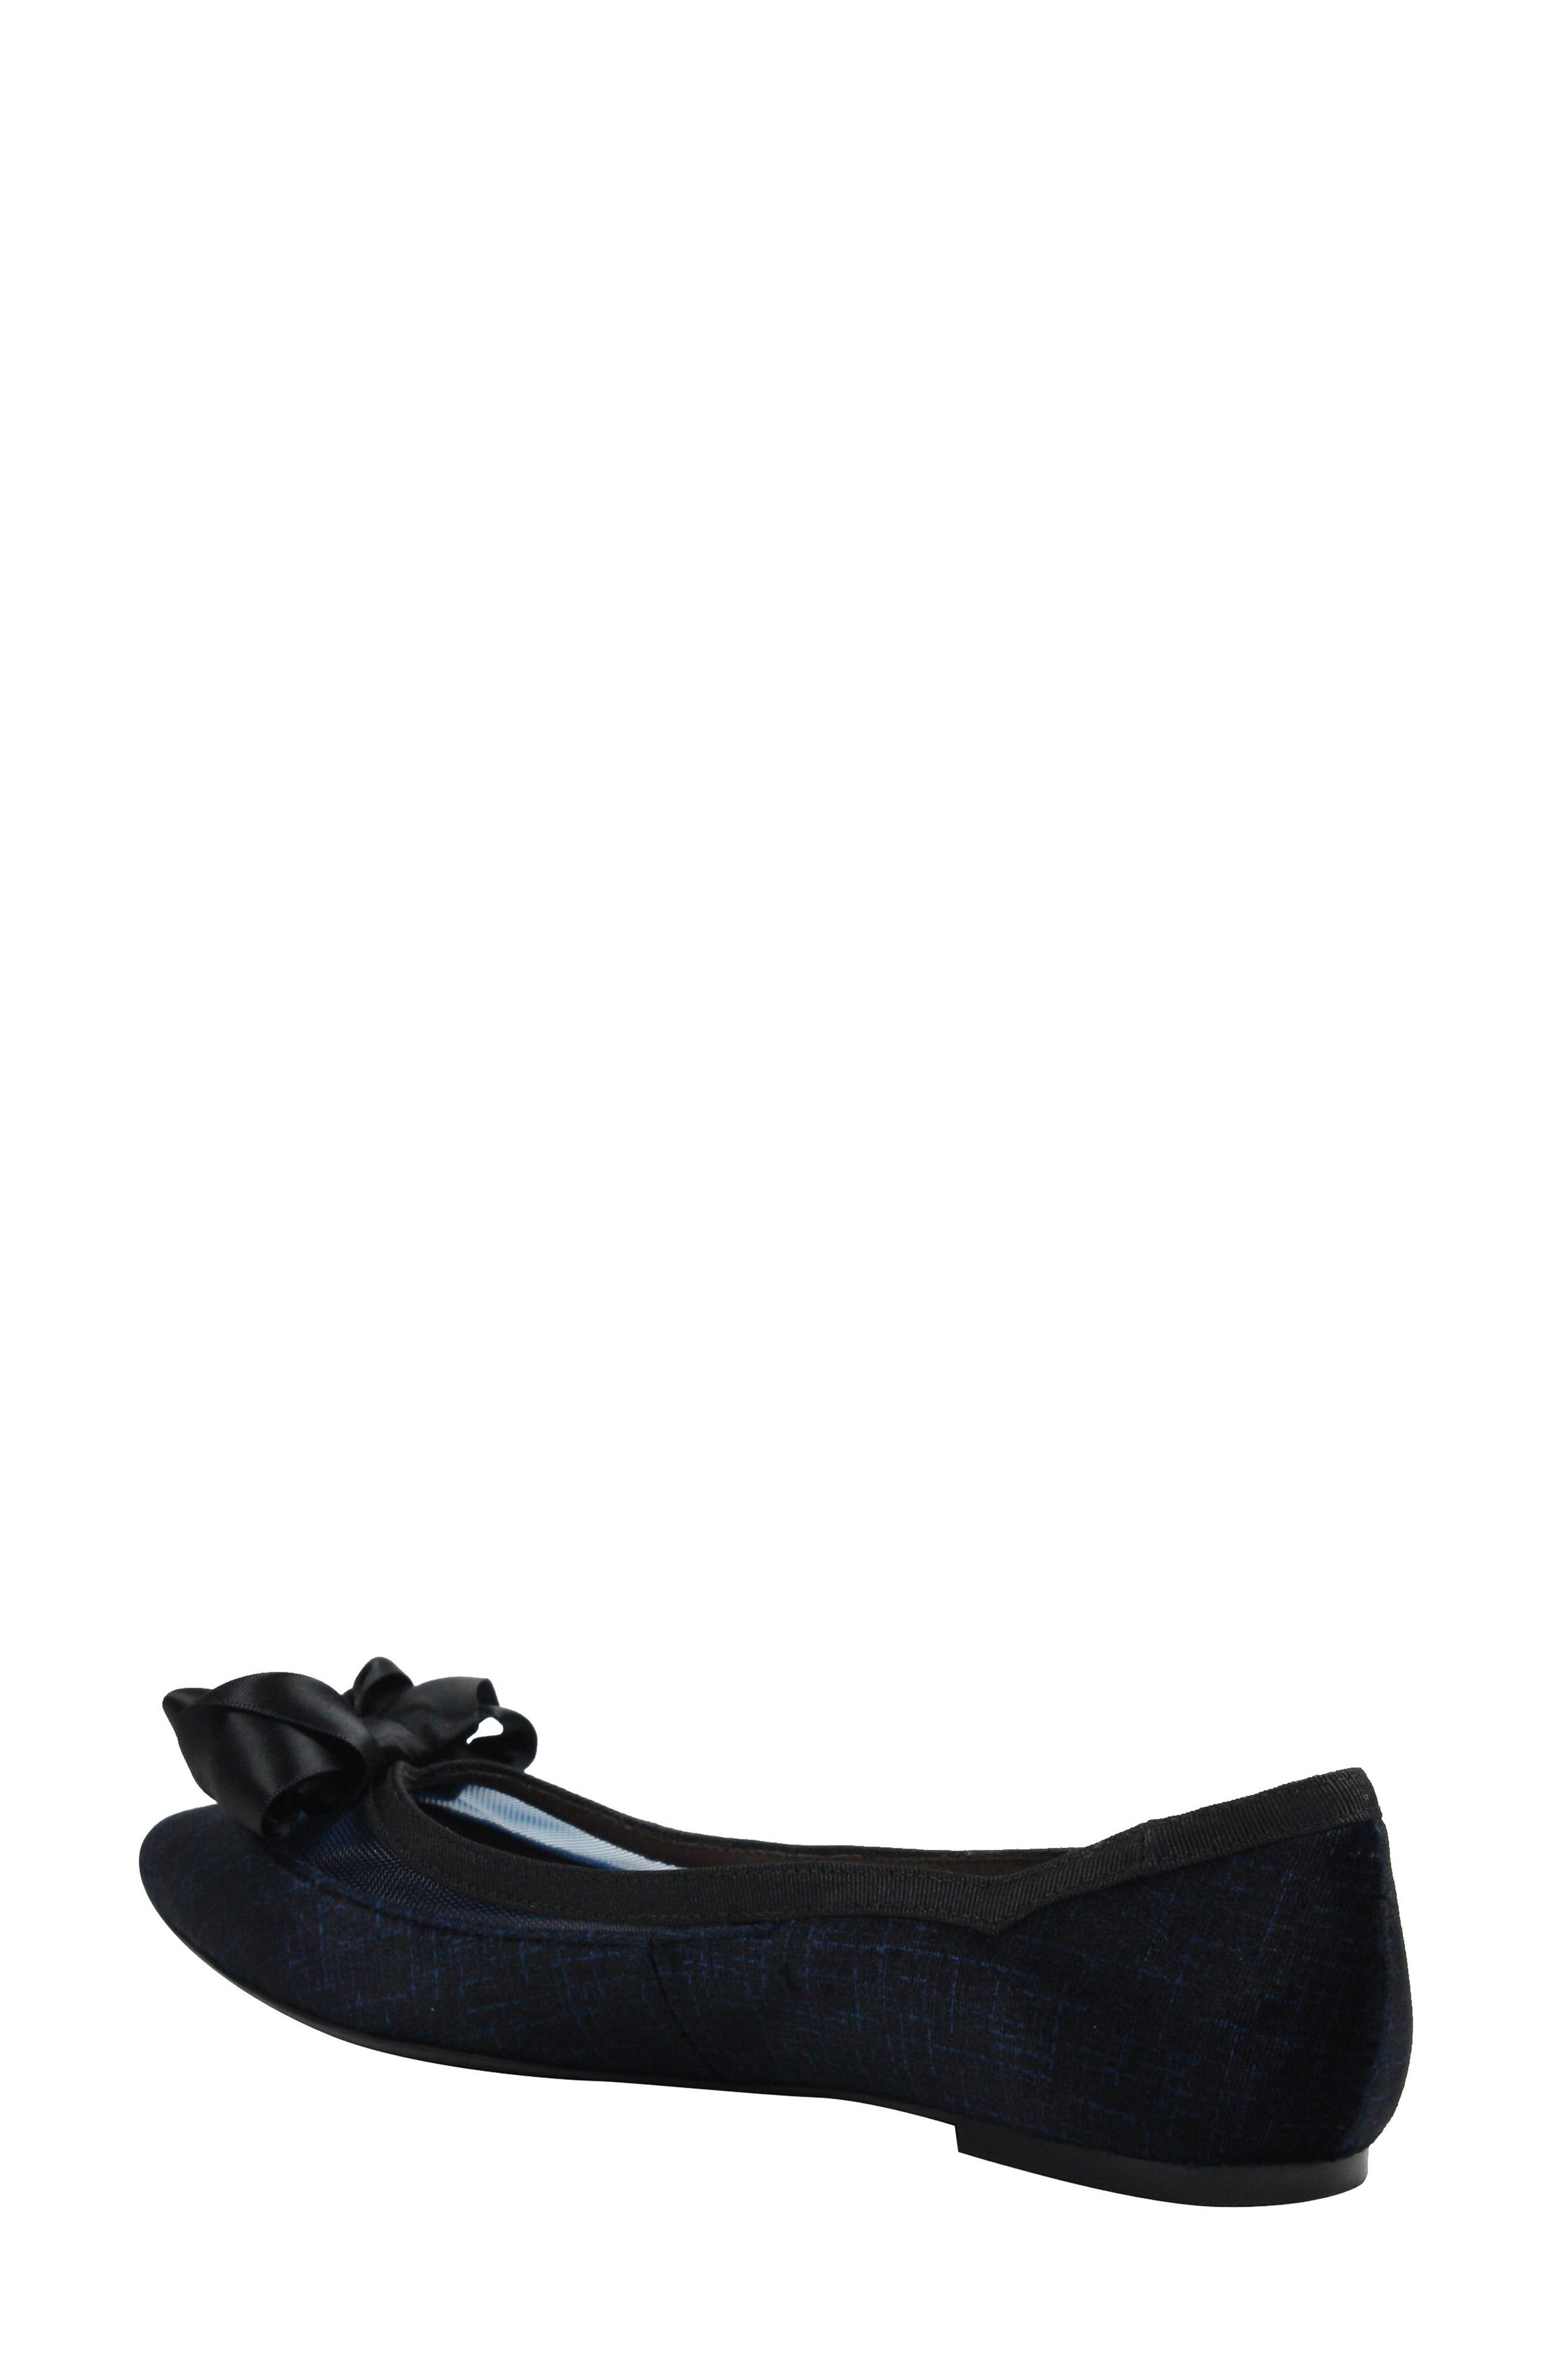 J. RENEÉ, Allitson Bow Flat, Alternate thumbnail 2, color, BLUE/ BLACK FABRIC